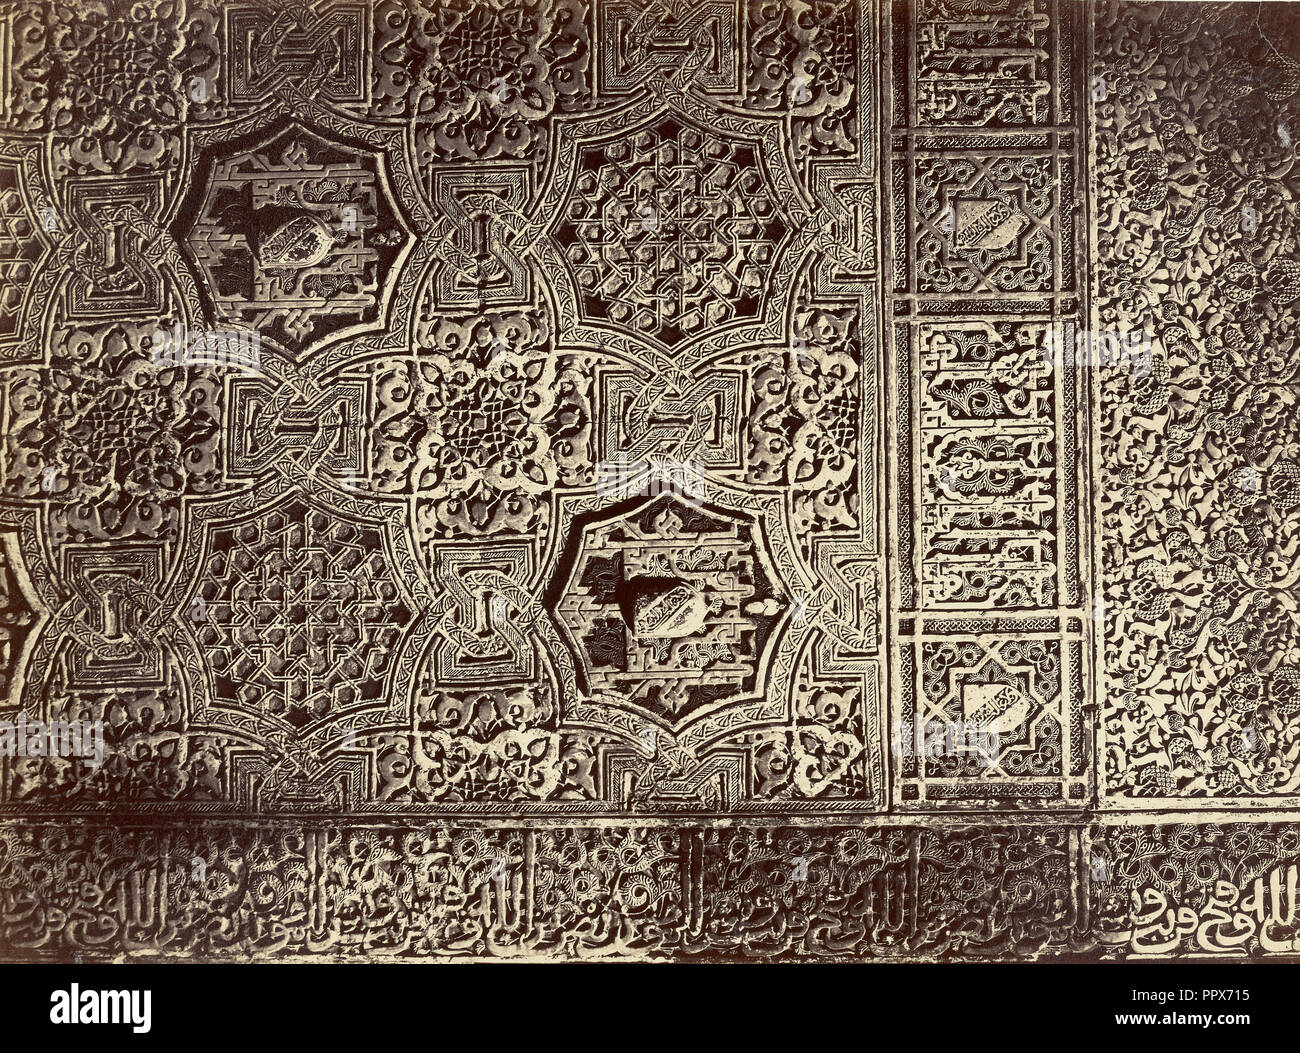 Detalle de la pared de la Sala de la Barca, con escala de 1m., Alhambra, Juan Laurent, French, 1816 - 1892, Granada, Spain - Stock Image